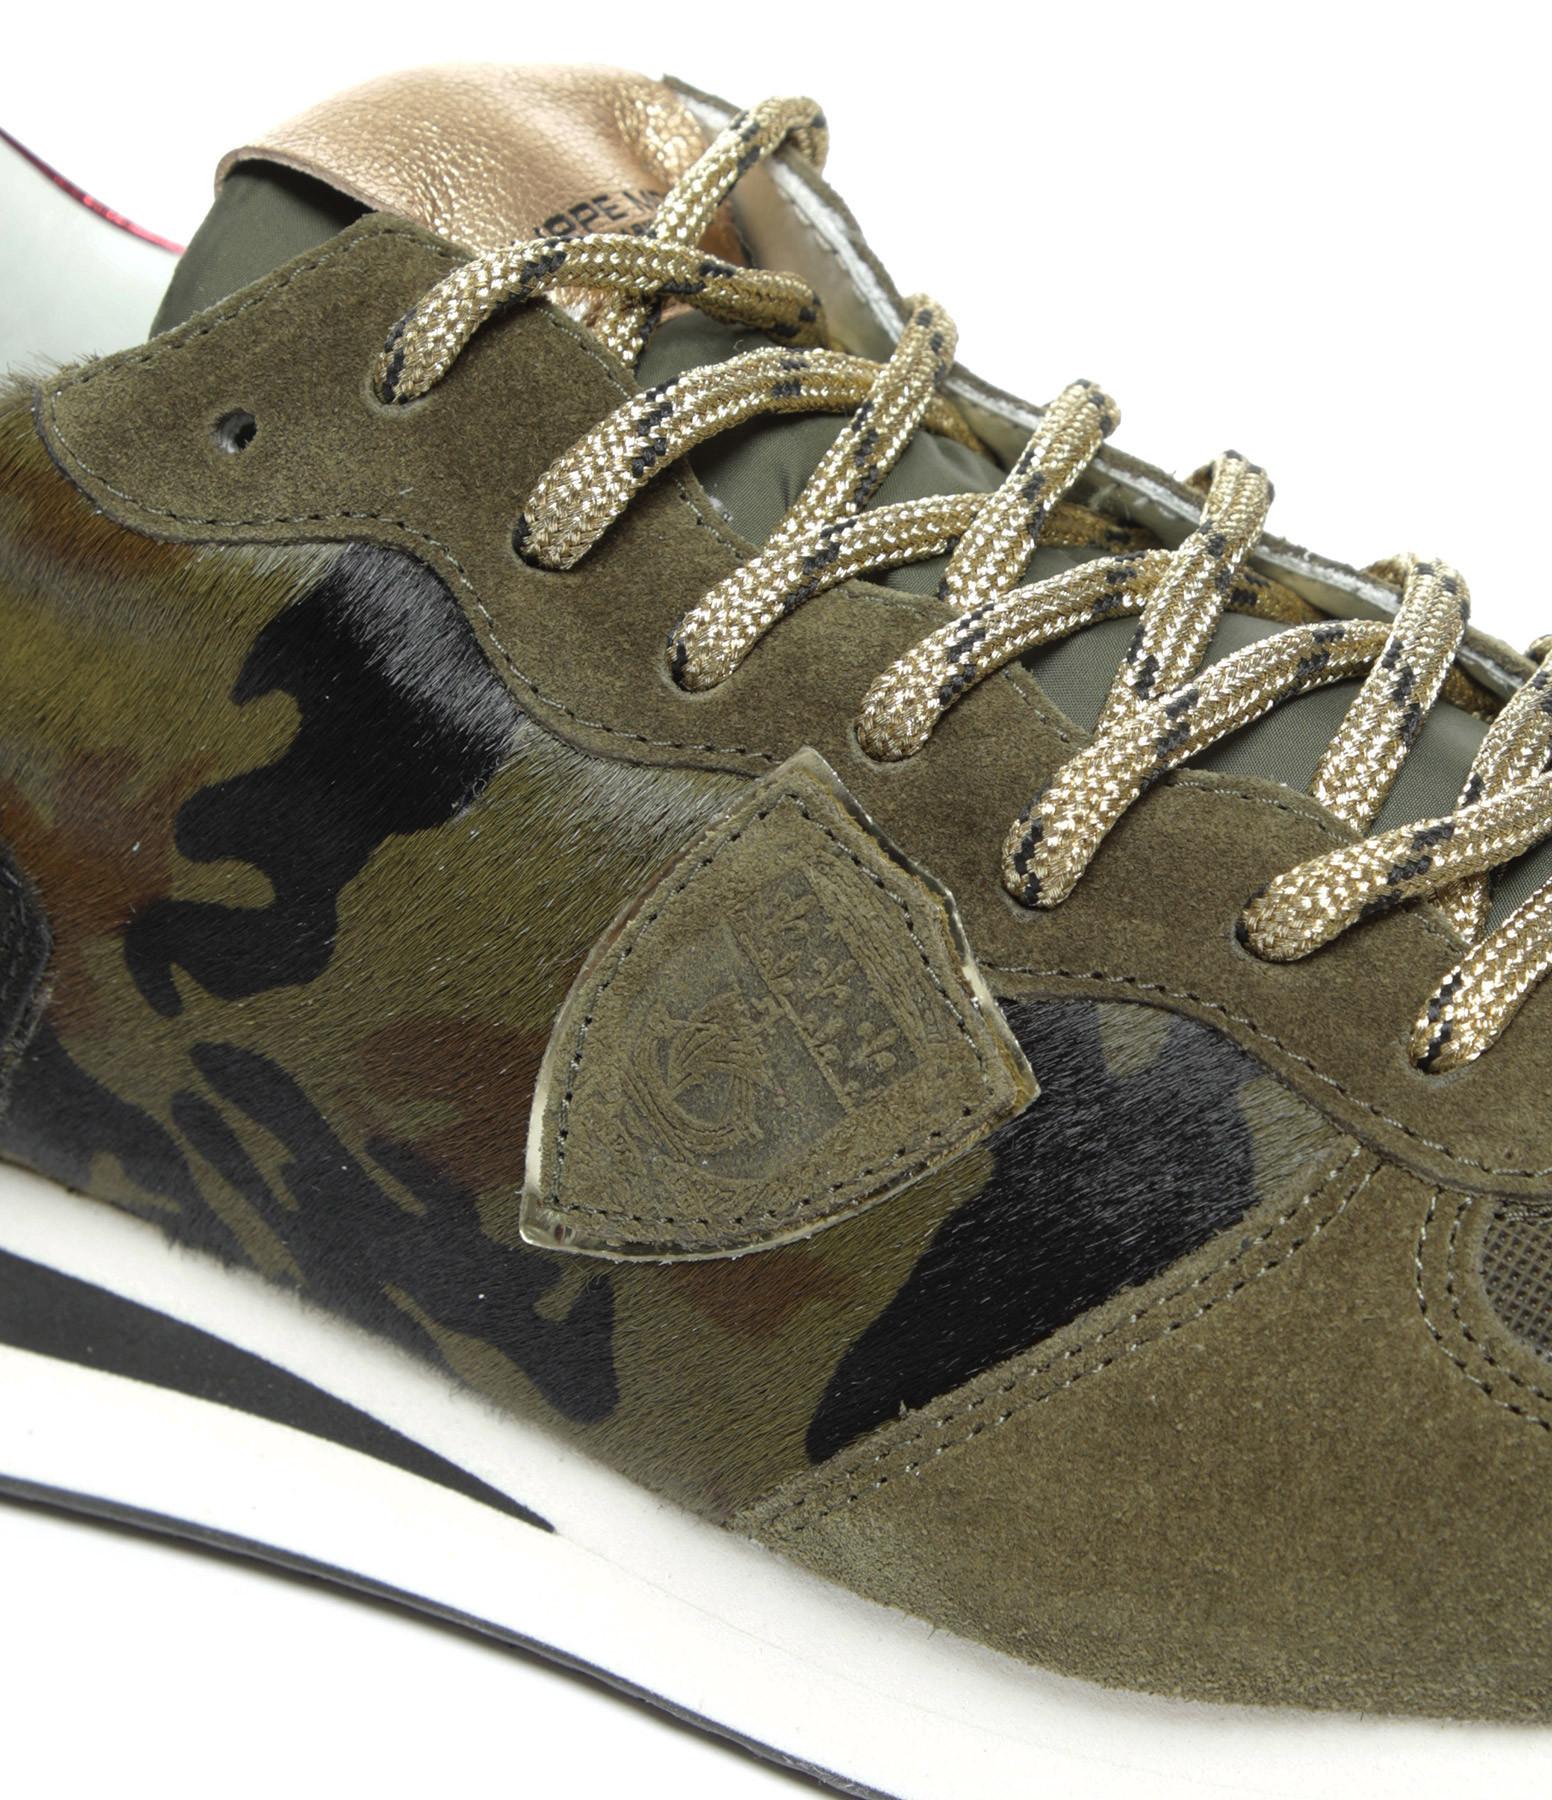 PHILIPPE MODEL - Baskets Trpx Pony Camouflage Kaki